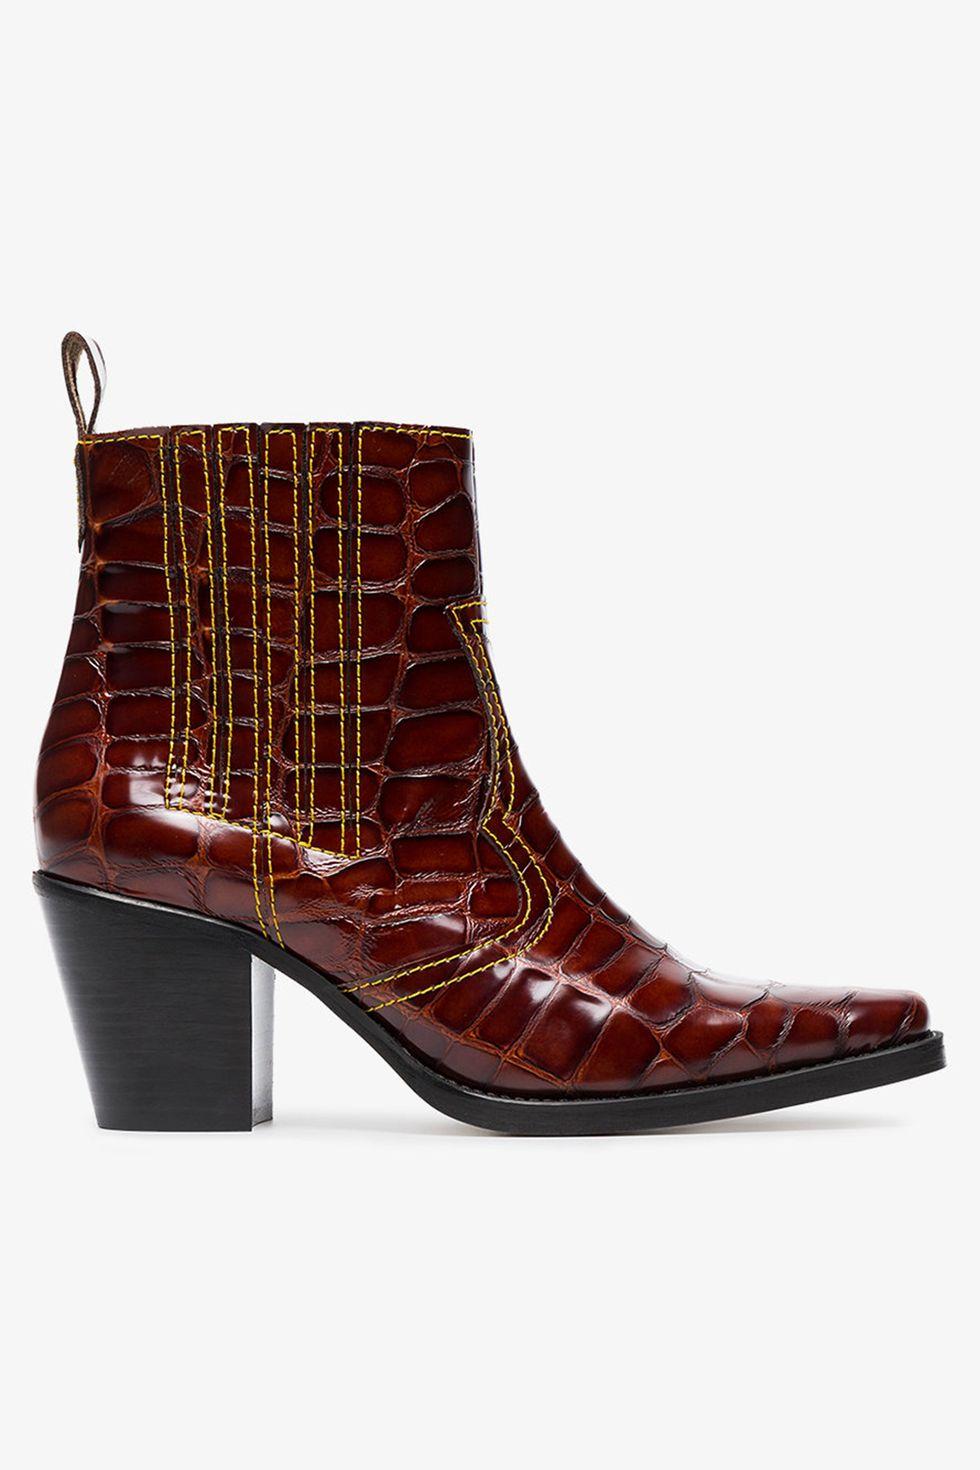 ganni-boots-1519660649.jpg